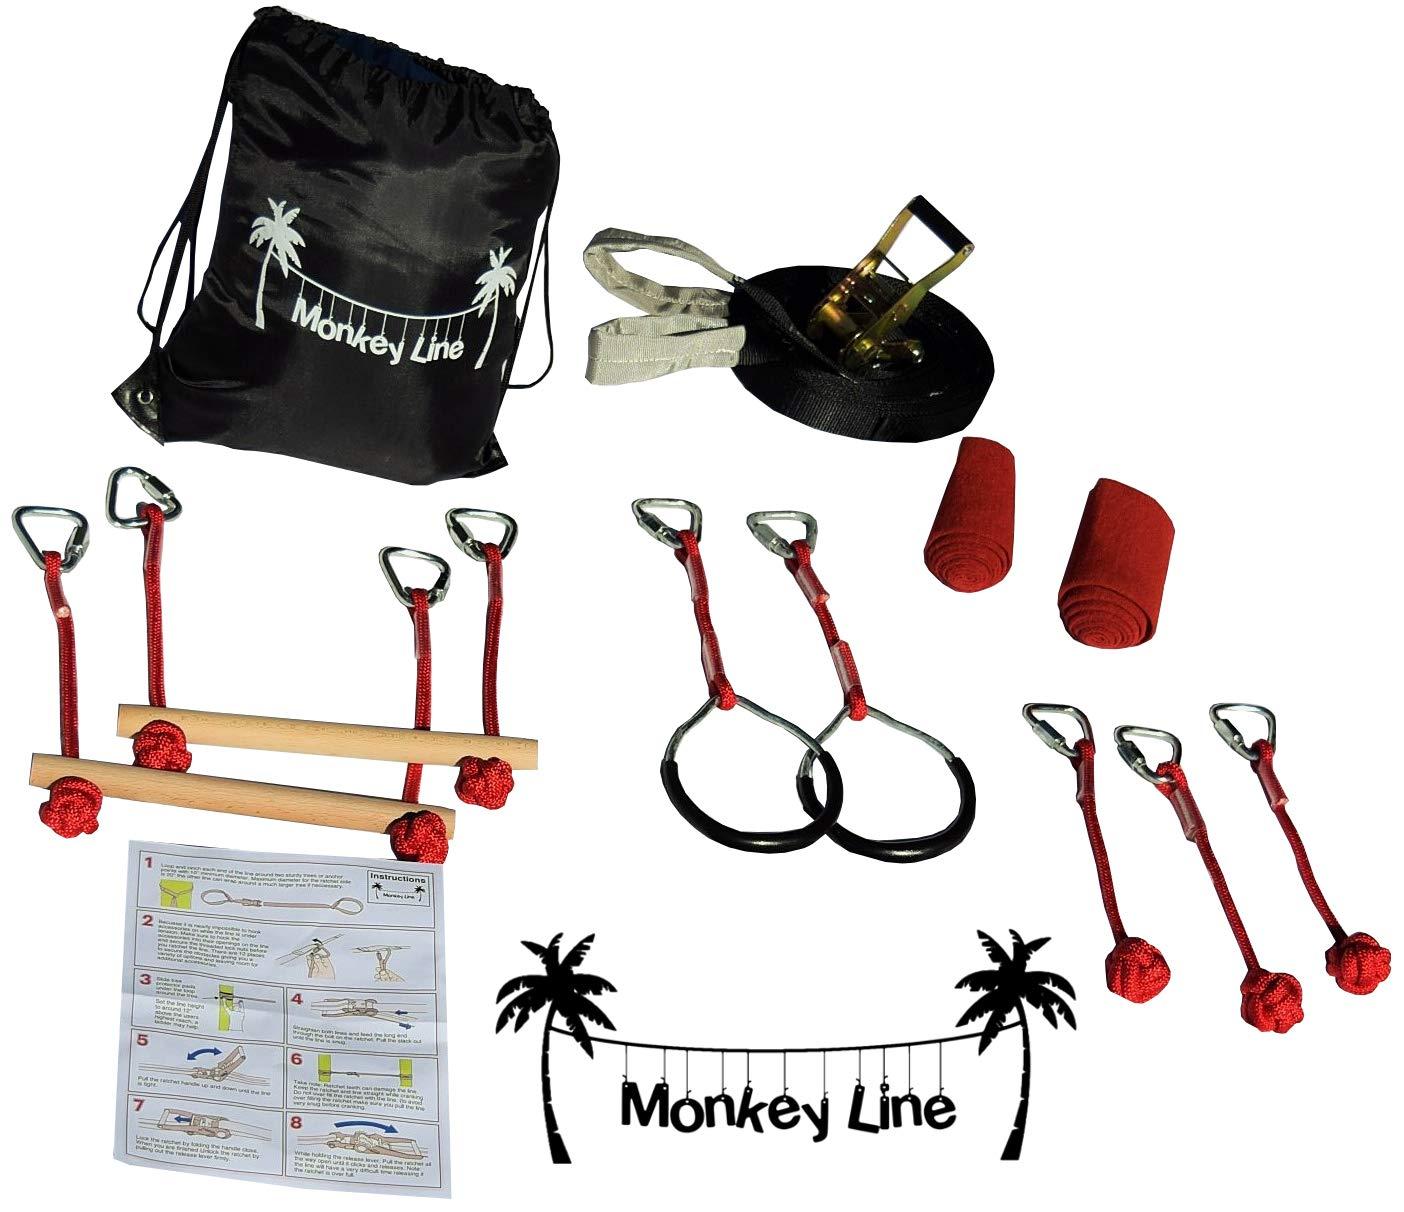 Monkey Line Jr. Ninja Warrior Junior Line 40 ft Ninja Warrior Backyard Training Equipment Kids | Fun Obstacles Slackline | Includes 7 Attachments